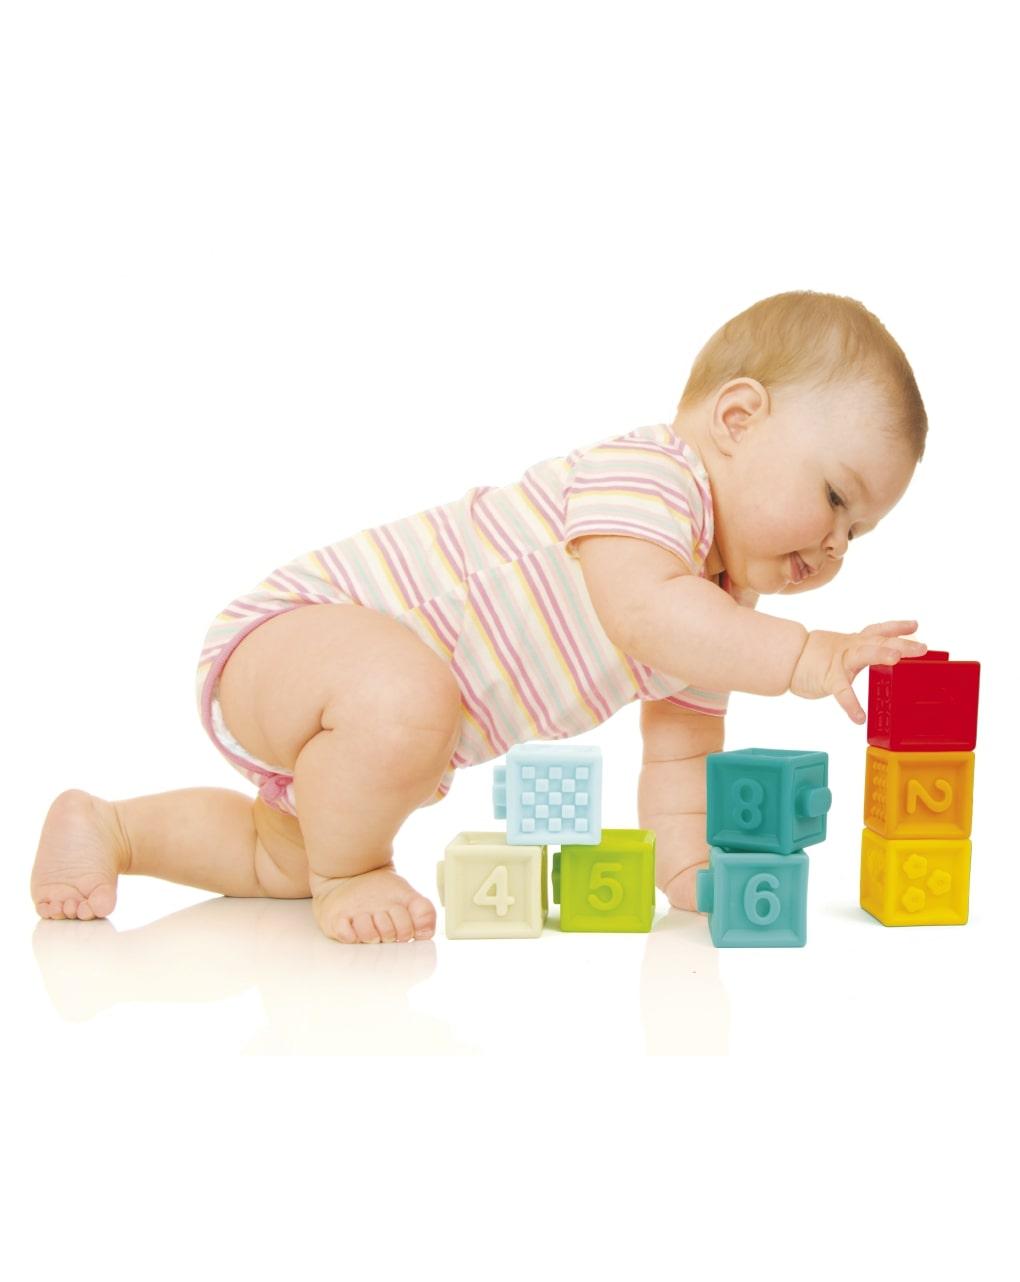 3 in 1 baby soft toys: 8 cune + 4 animal + 8 ball - Prénatal